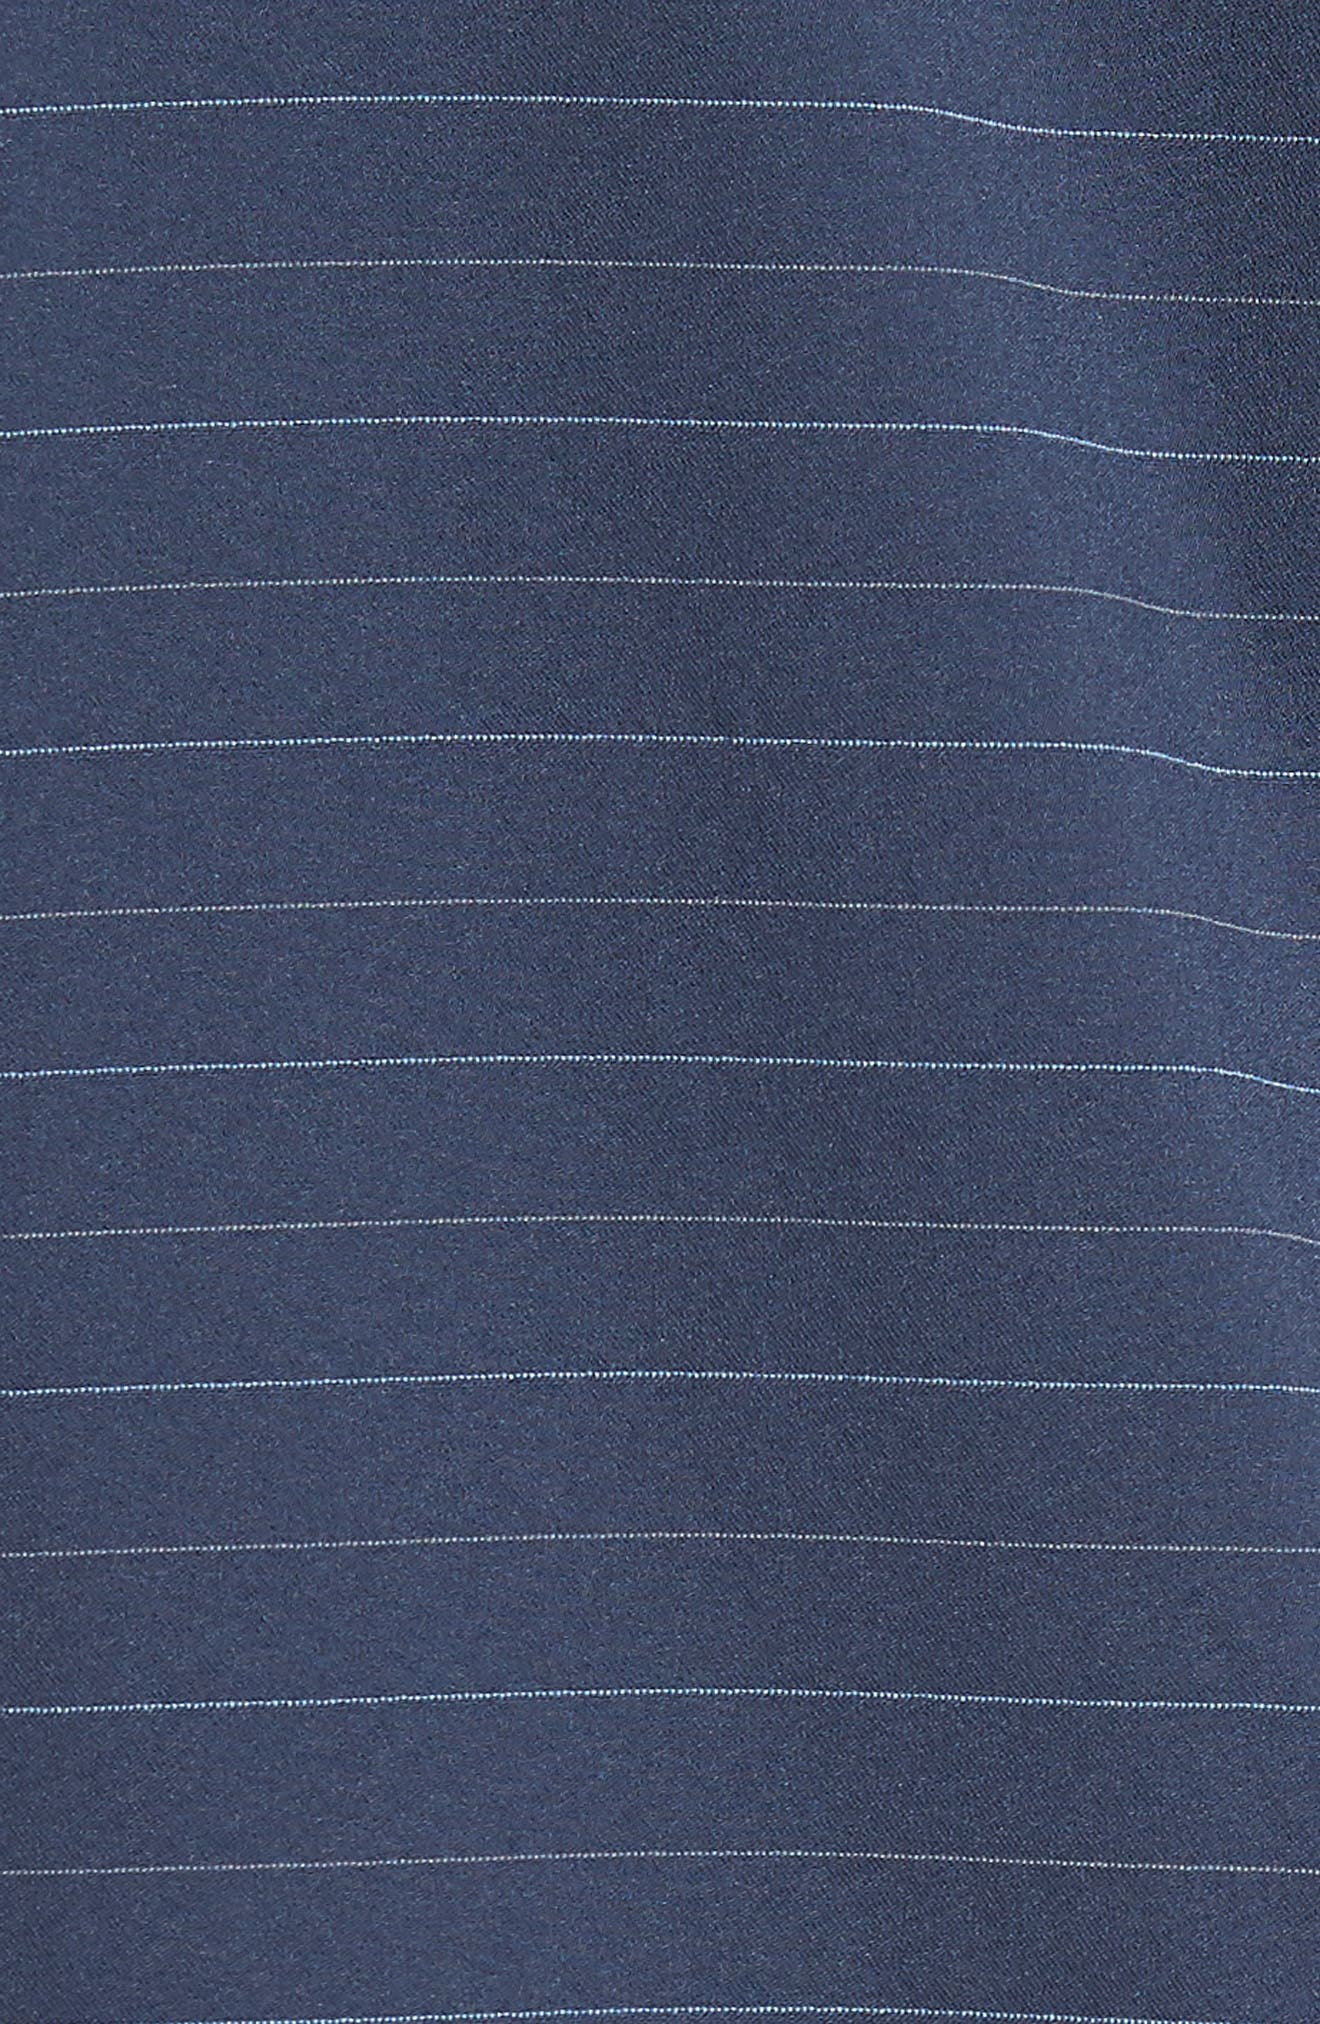 Vagabond Regular Fit Sport Shirt,                             Alternate thumbnail 3, color,                             Heather Blue Nights